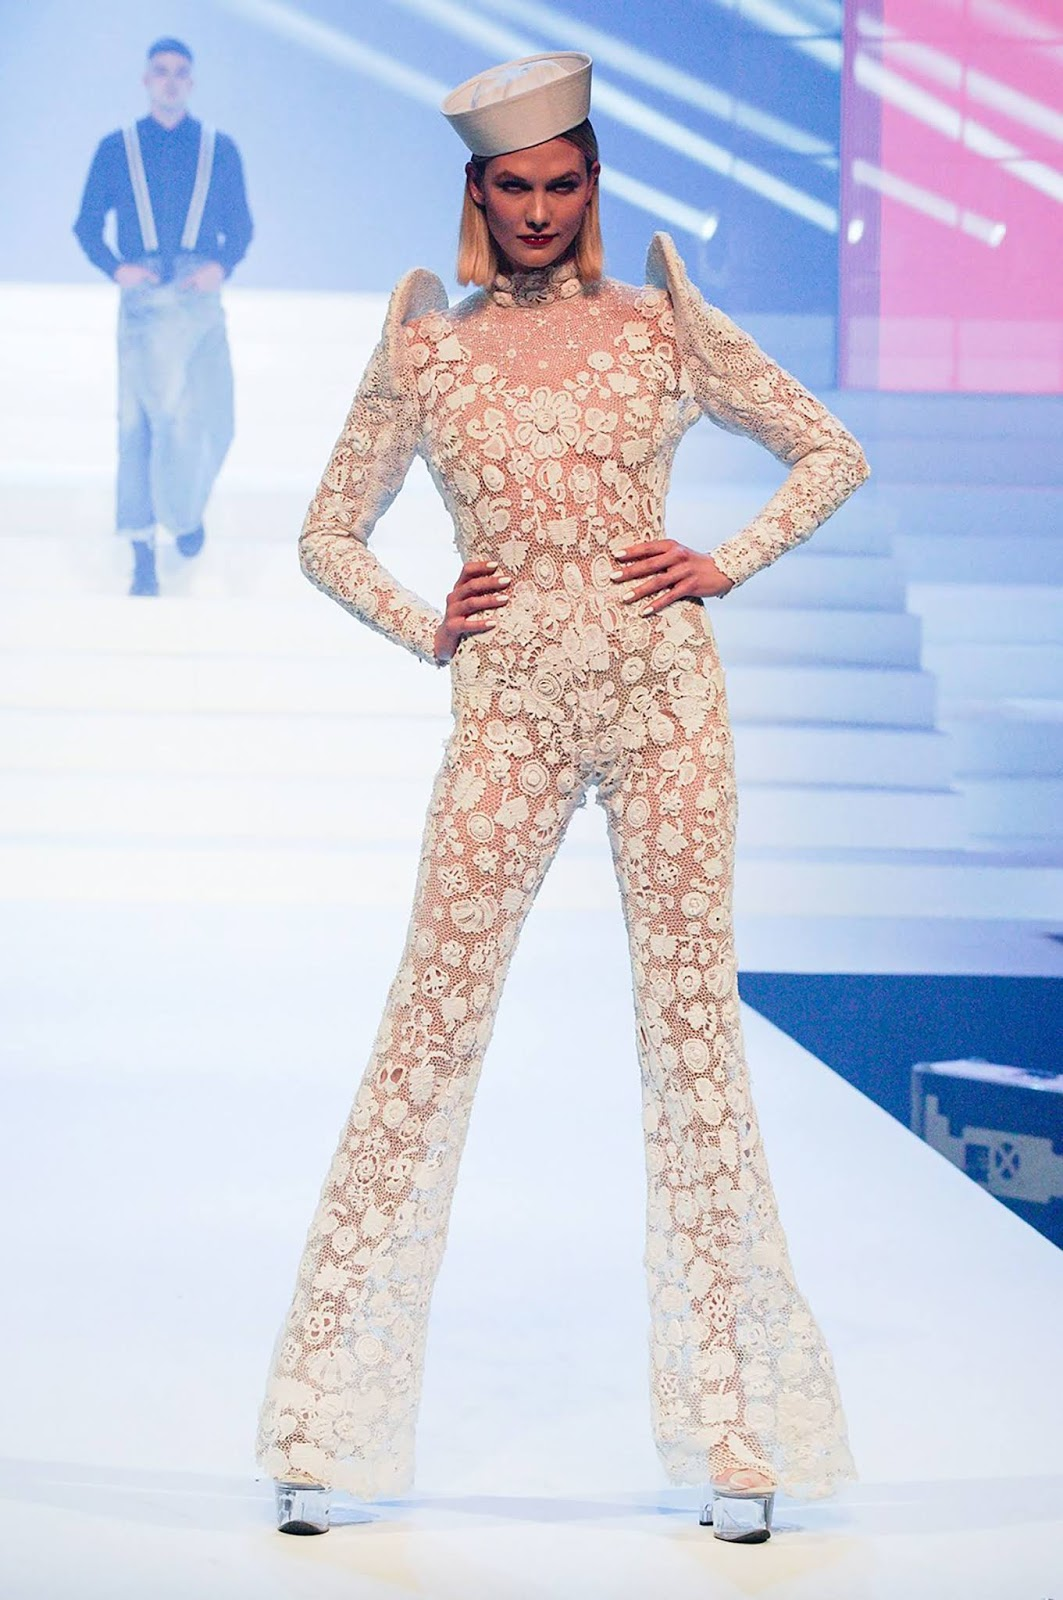 Actriz Porno Gaultier fashionfrenicos